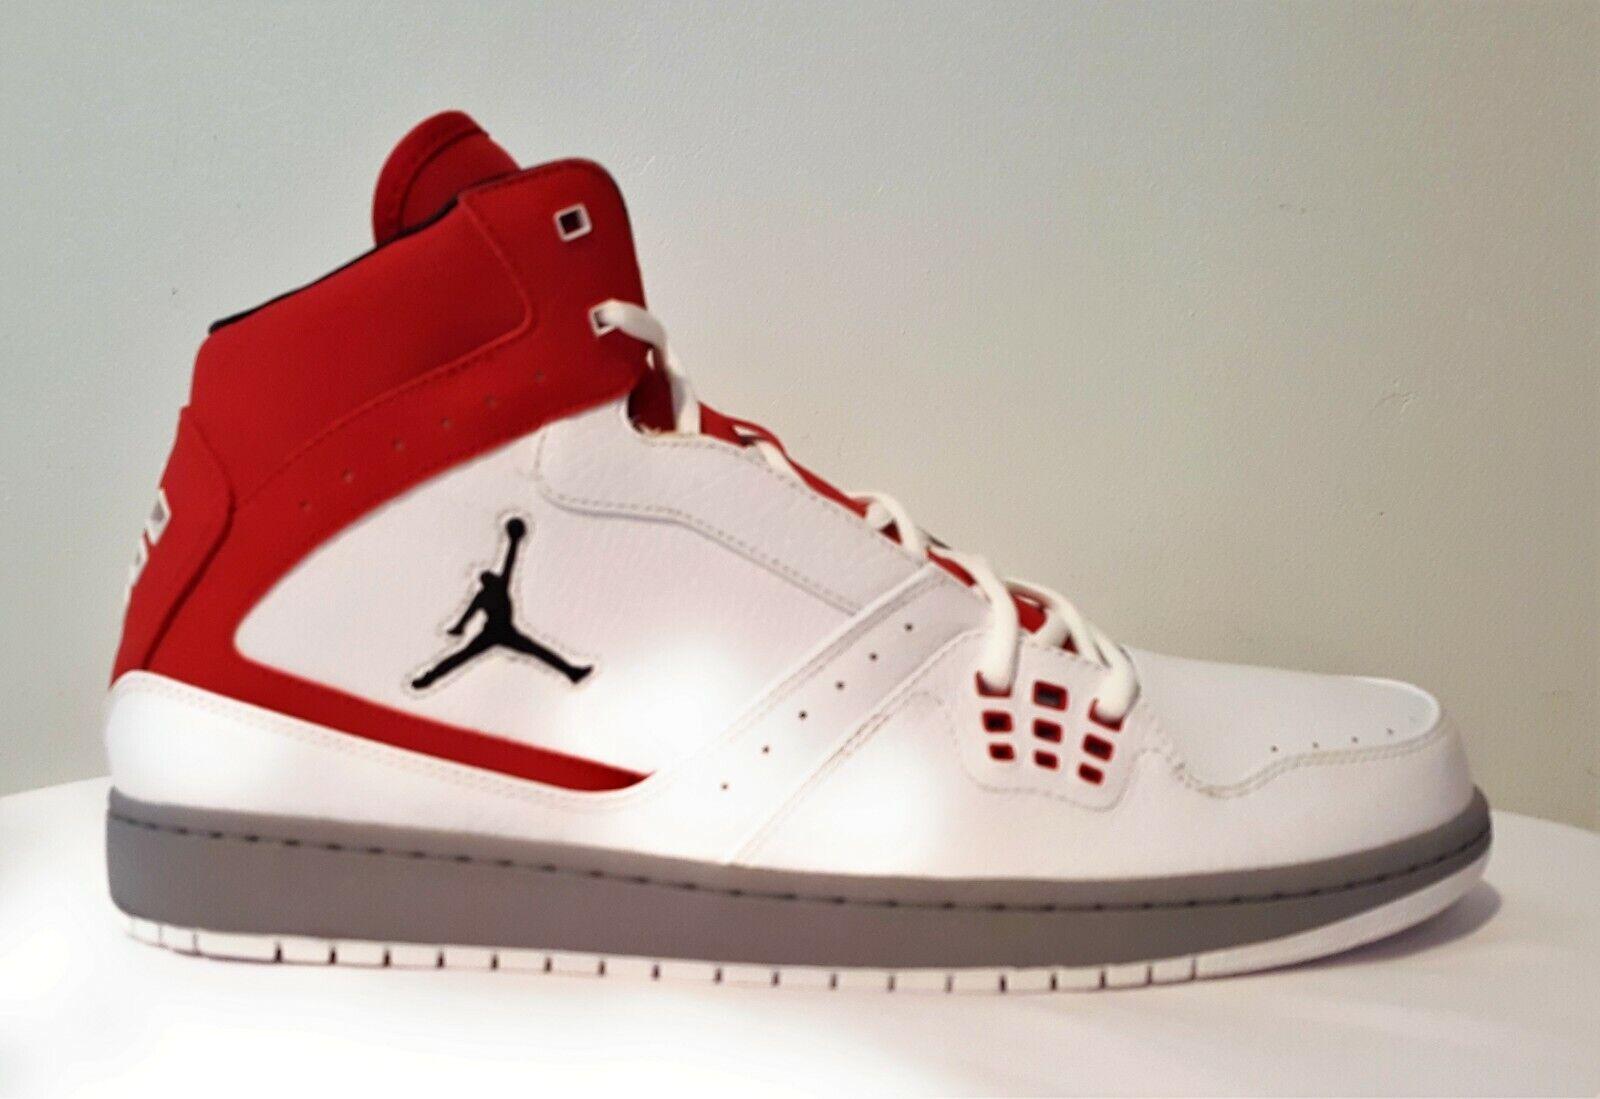 Nike Jordan 1 Flight New Men's 372704 124 White Basketball shoes Size 13